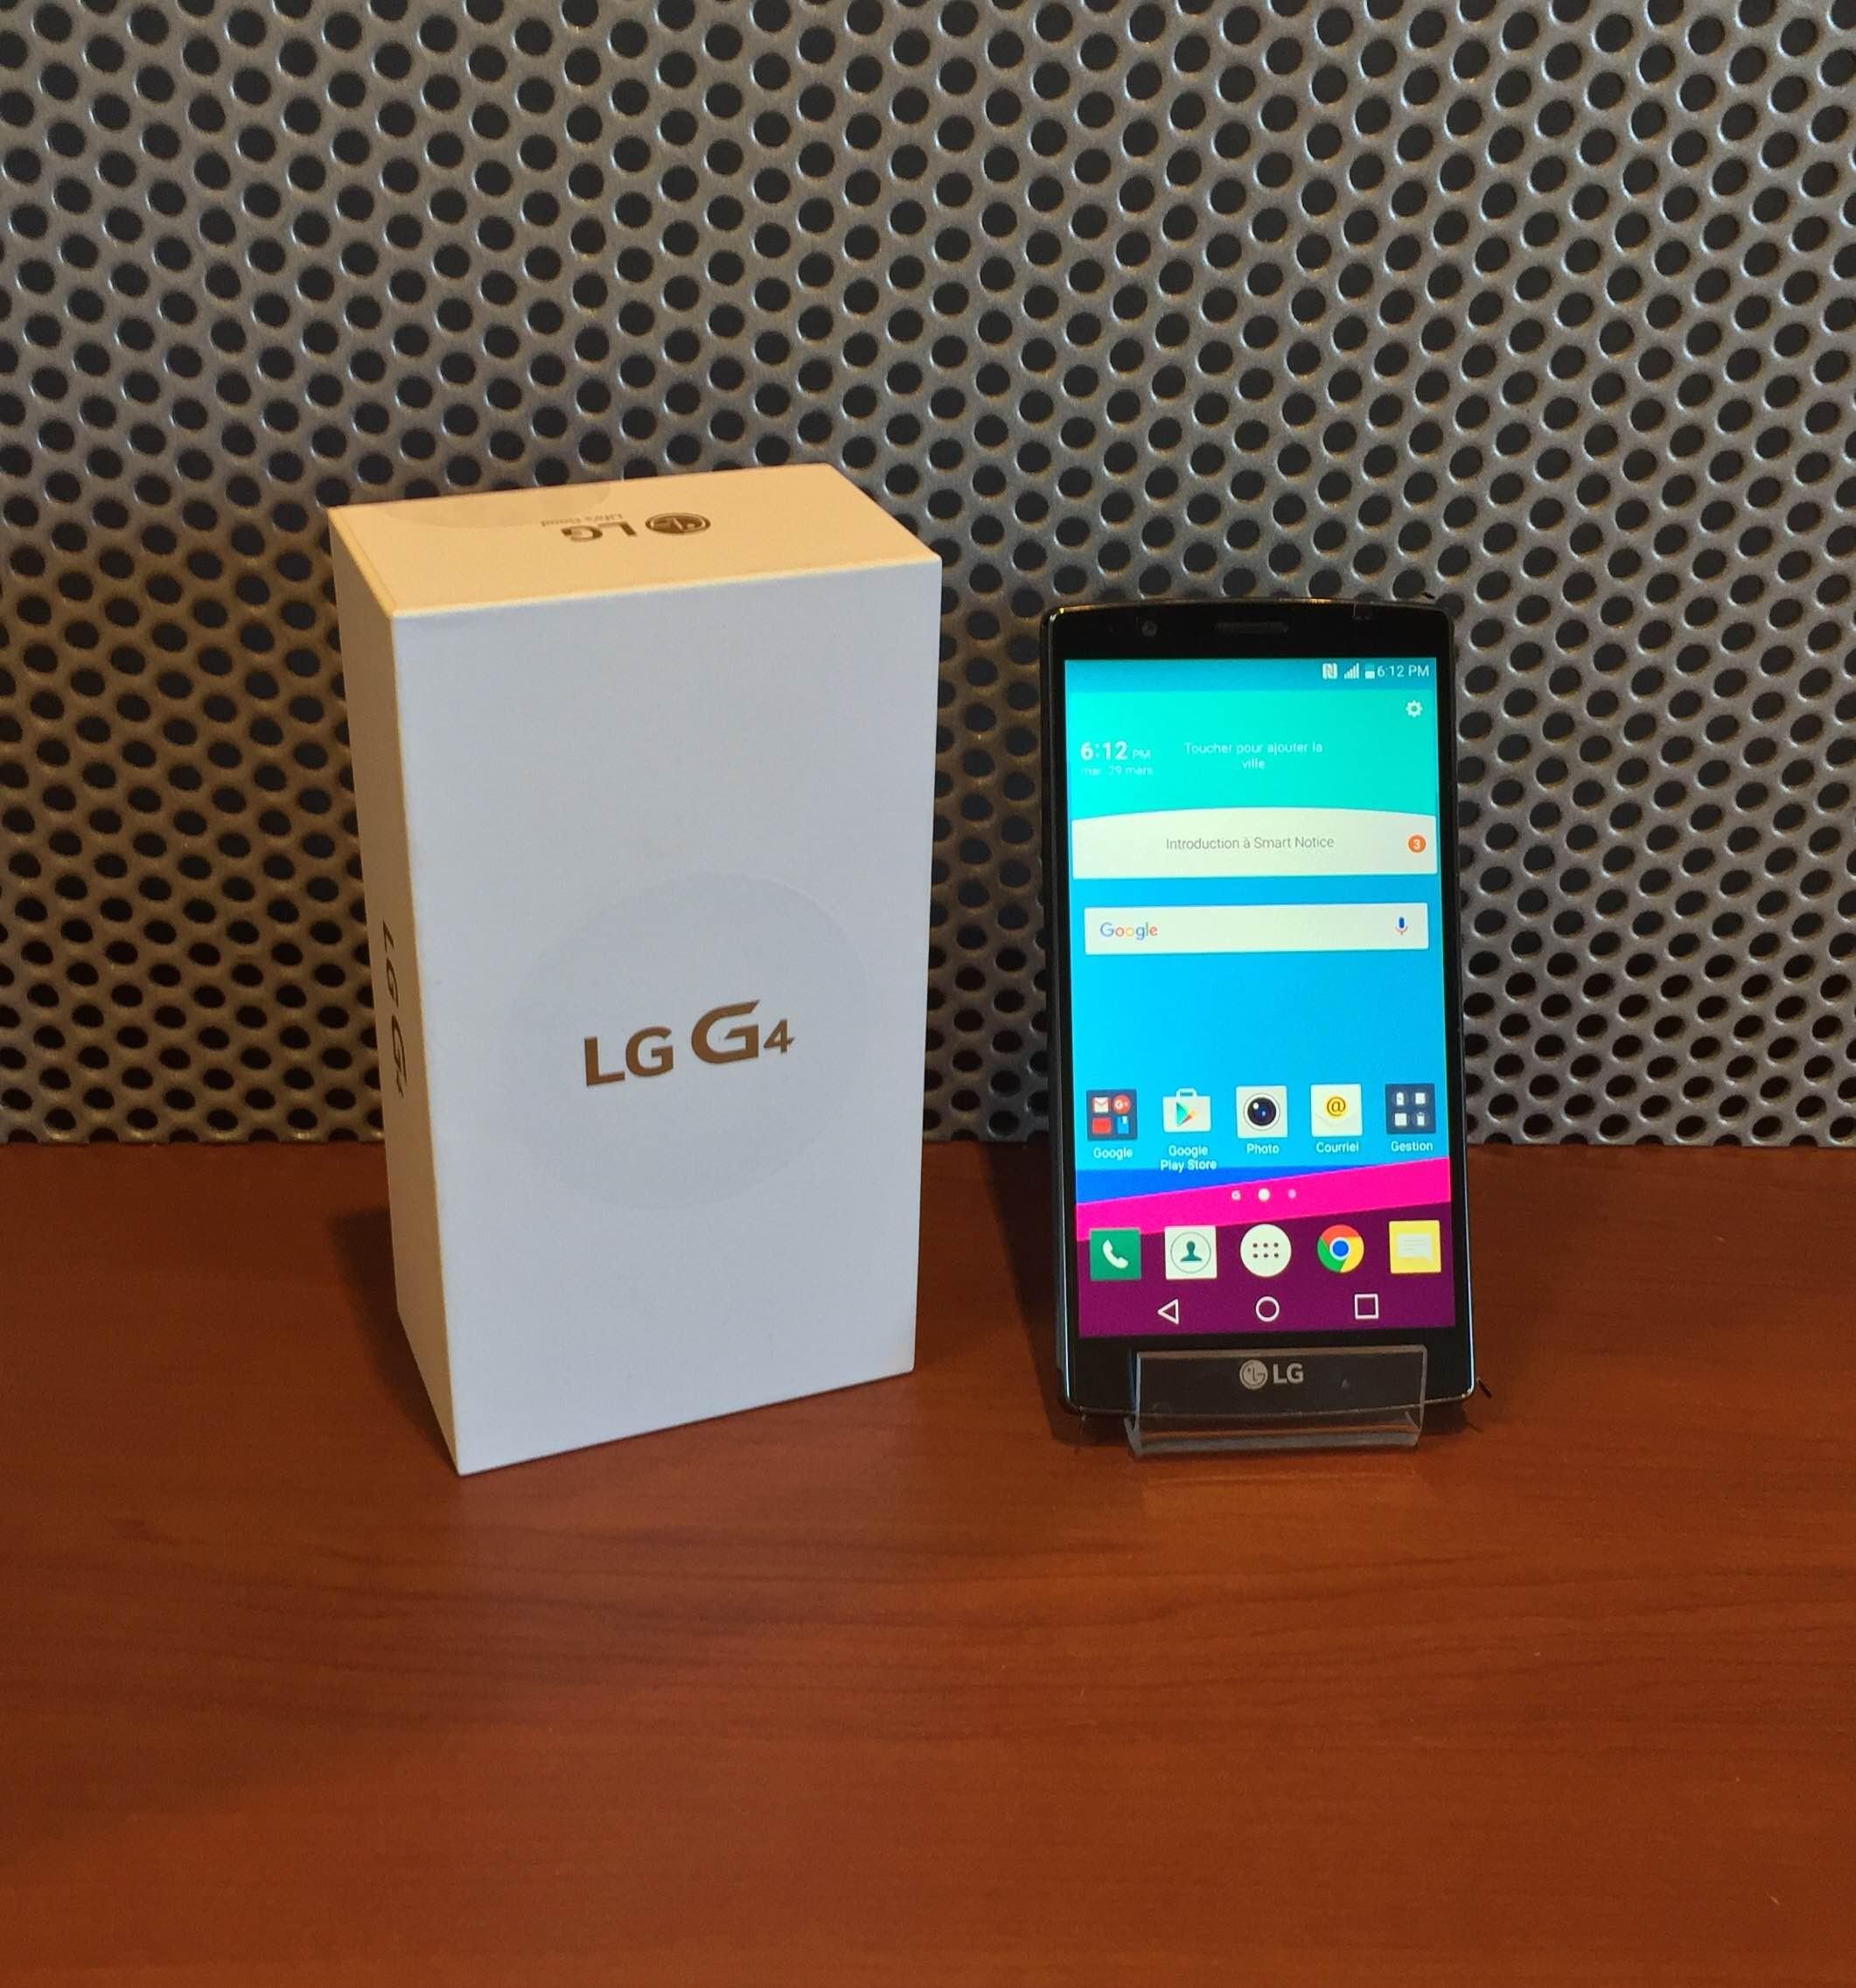 LG G4 - COMME NEUF - Noir - Unlock - 32 GB